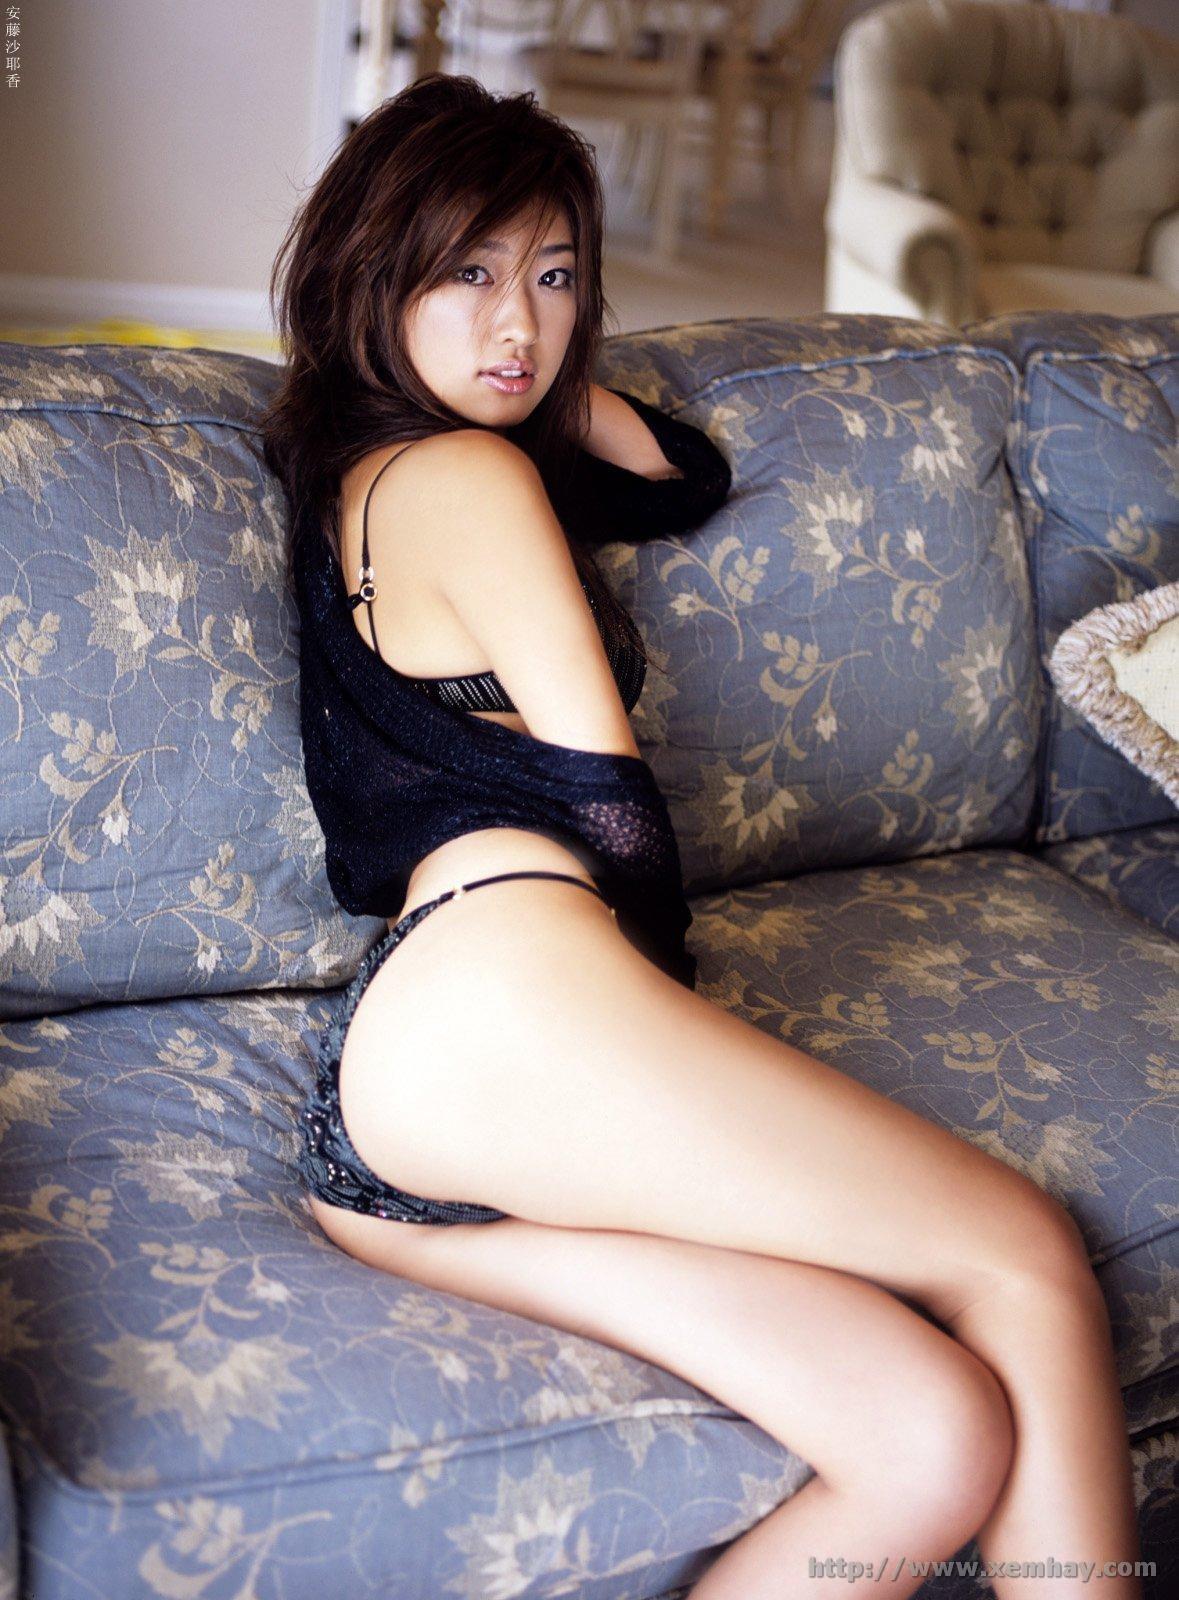 celebrity nude pics women